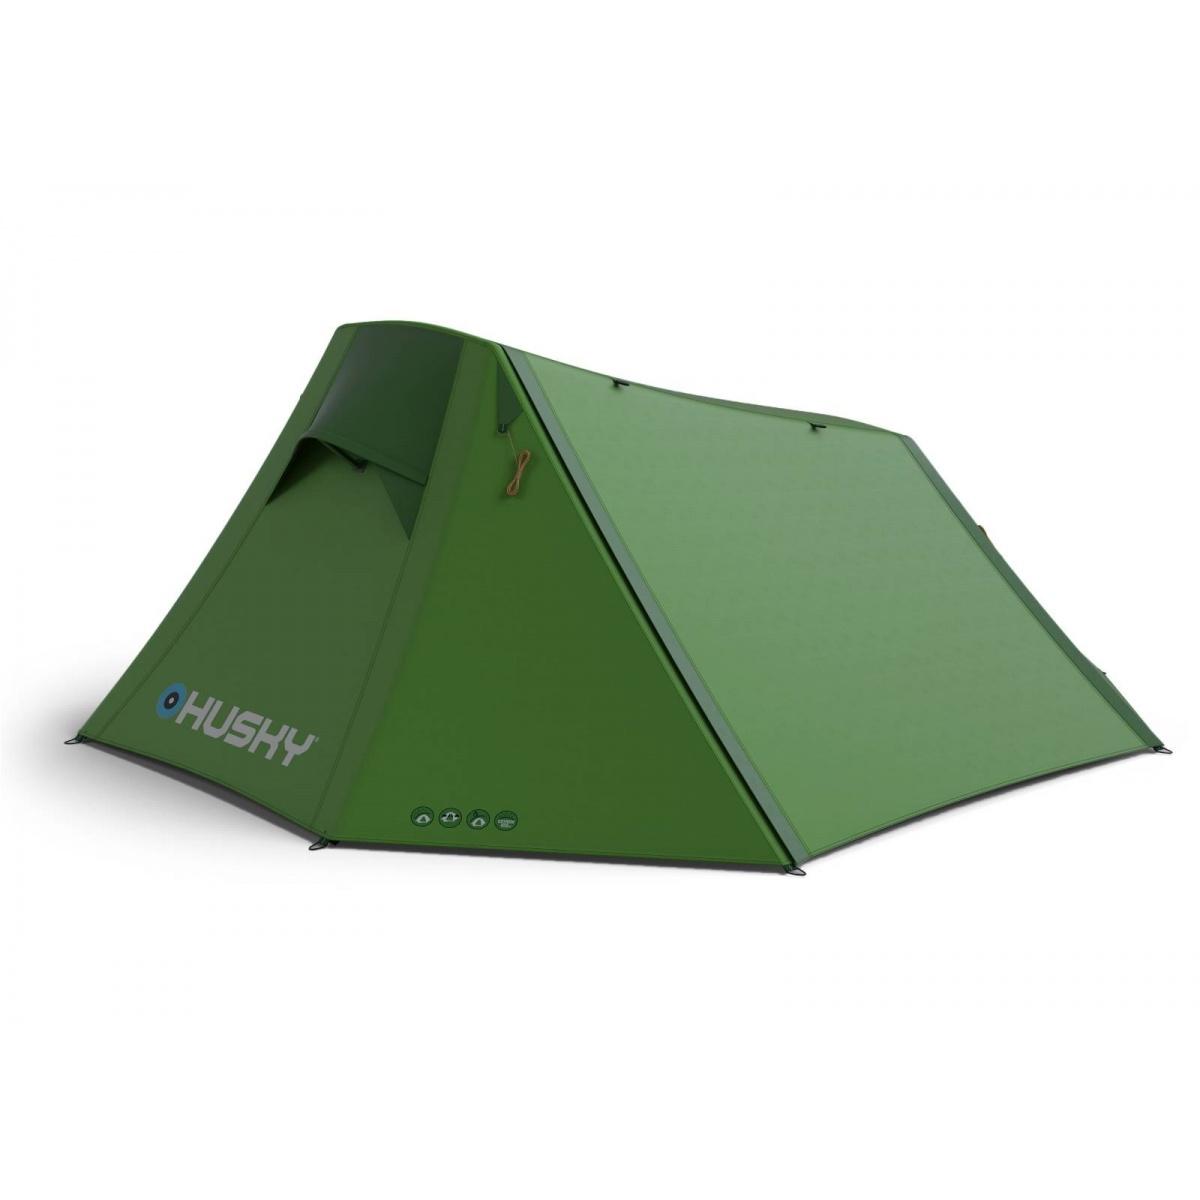 Husky Brunel 2 zelená Stan Extreme Lite